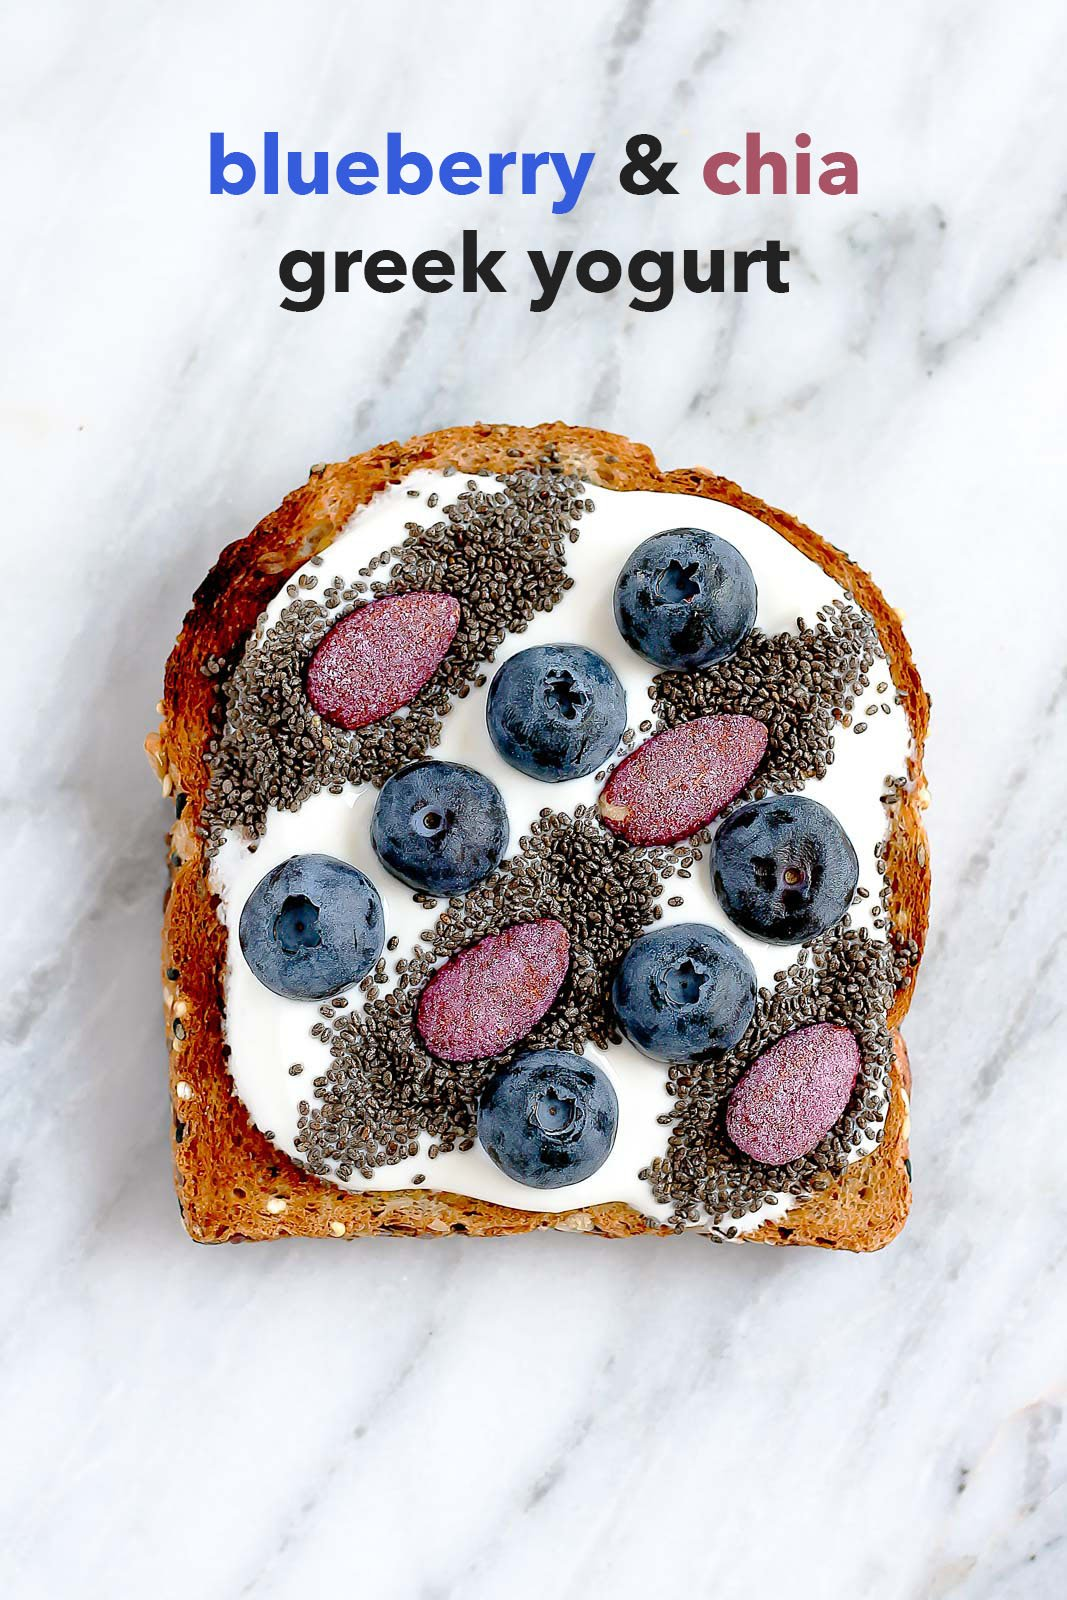 Greek yogurt, chia seeds & blueberries on toast + tons of healthy toast toppings!